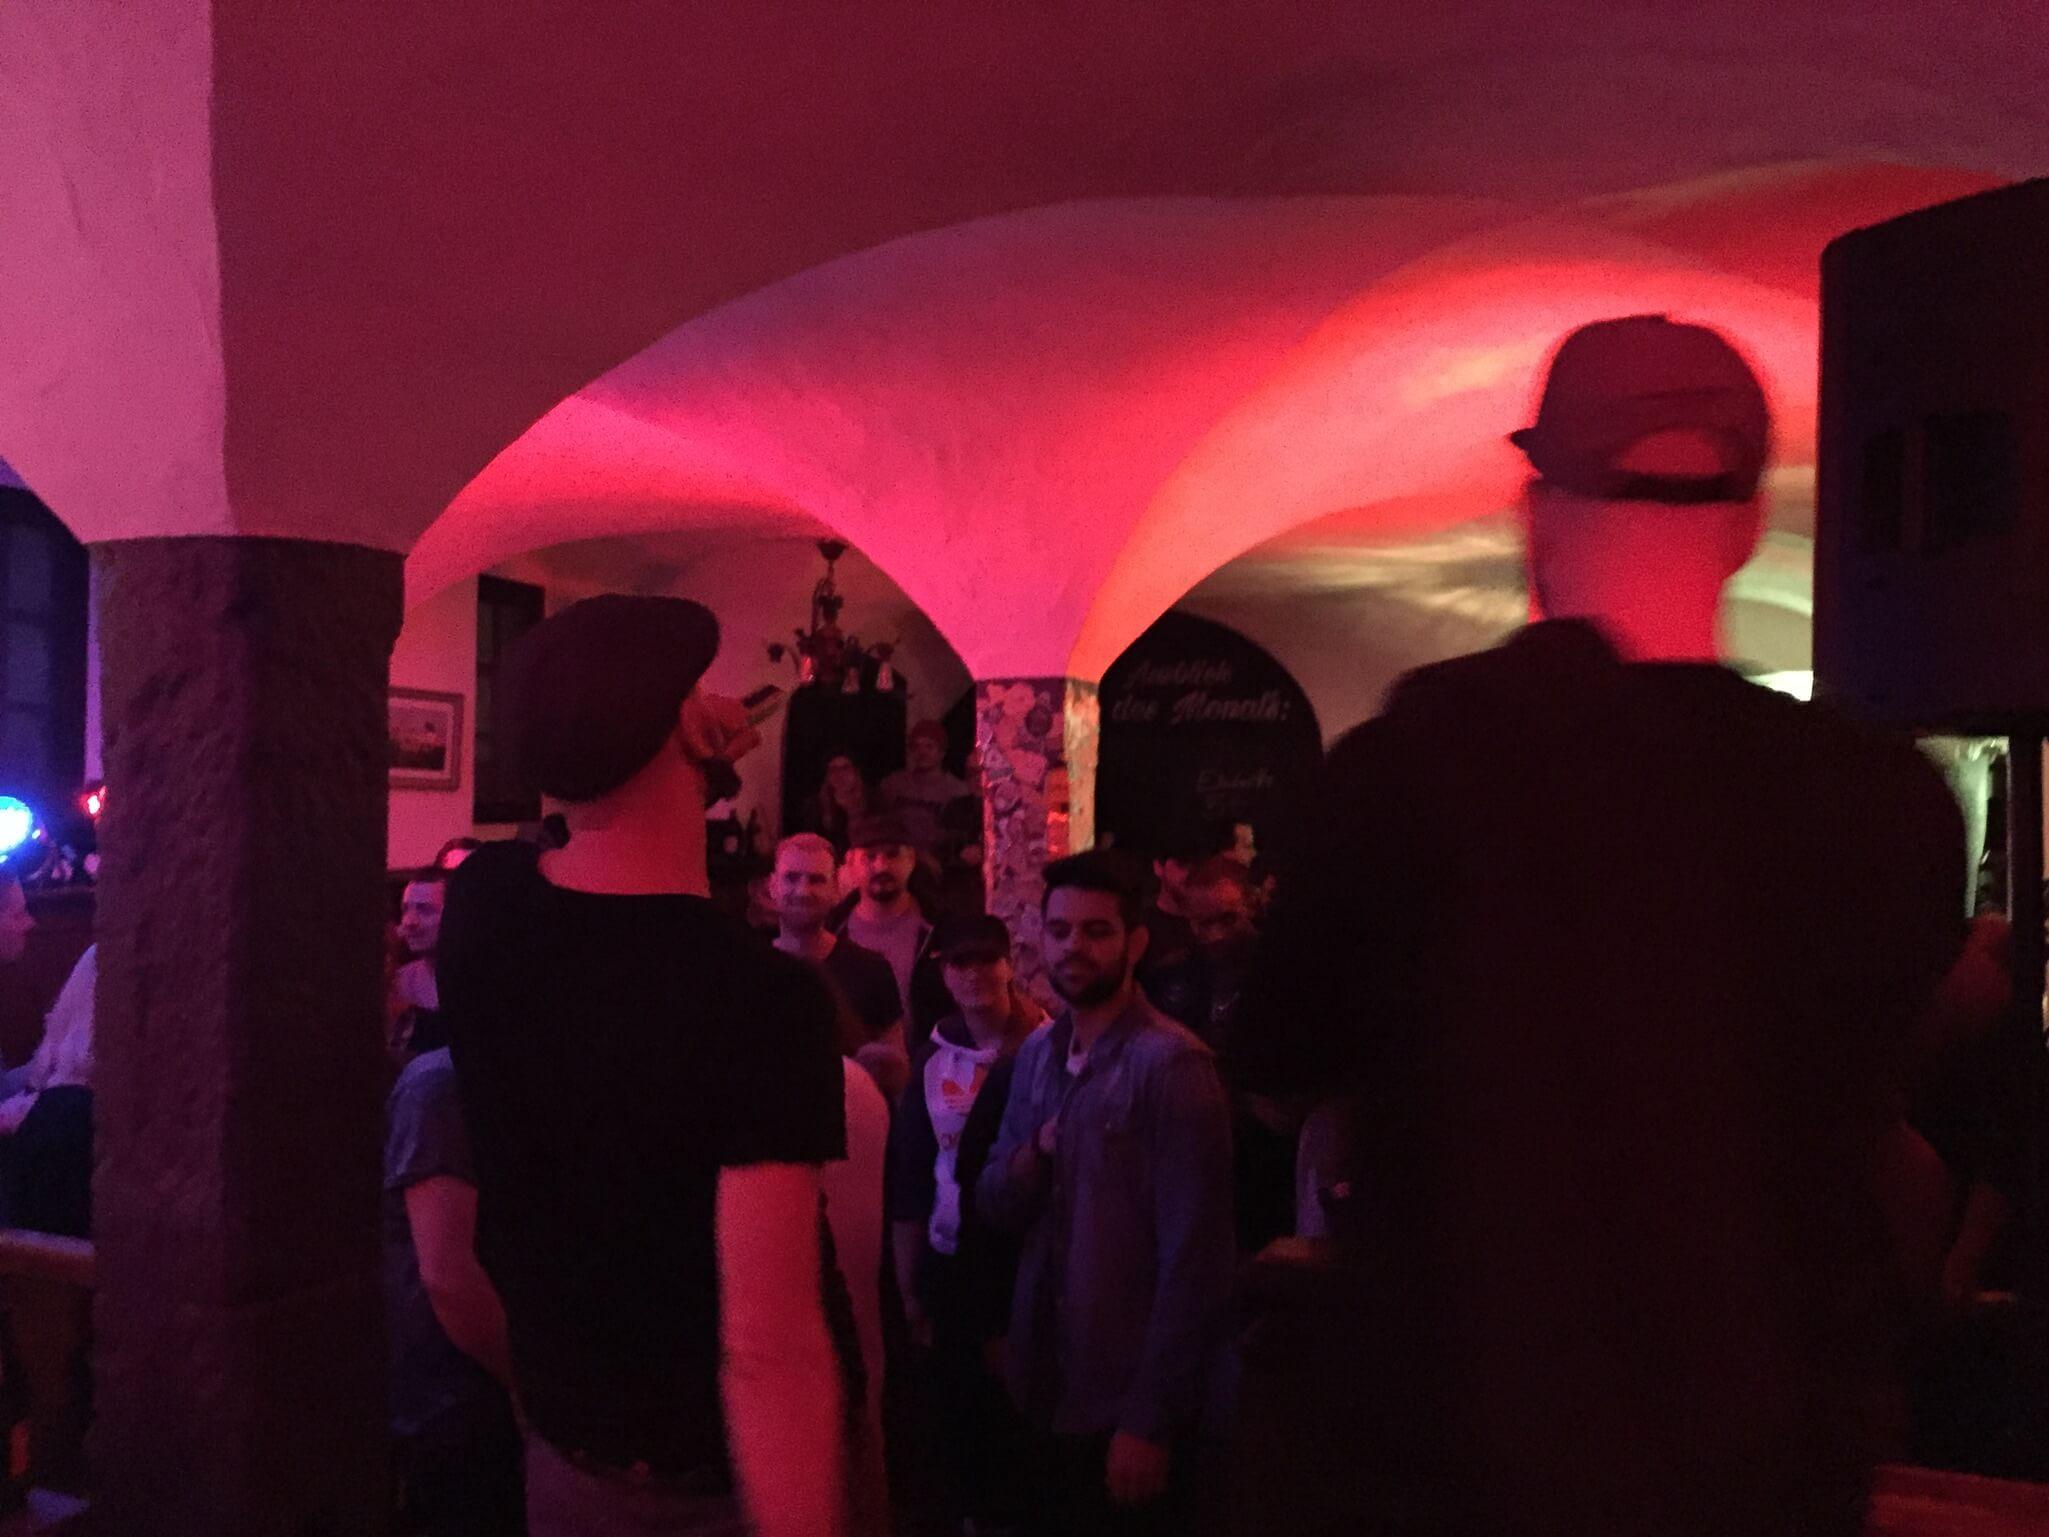 Heinz und Crowd. Company Slow. Frankenburger. Live Hip Hop. Bratwurst Rap. Coburg.